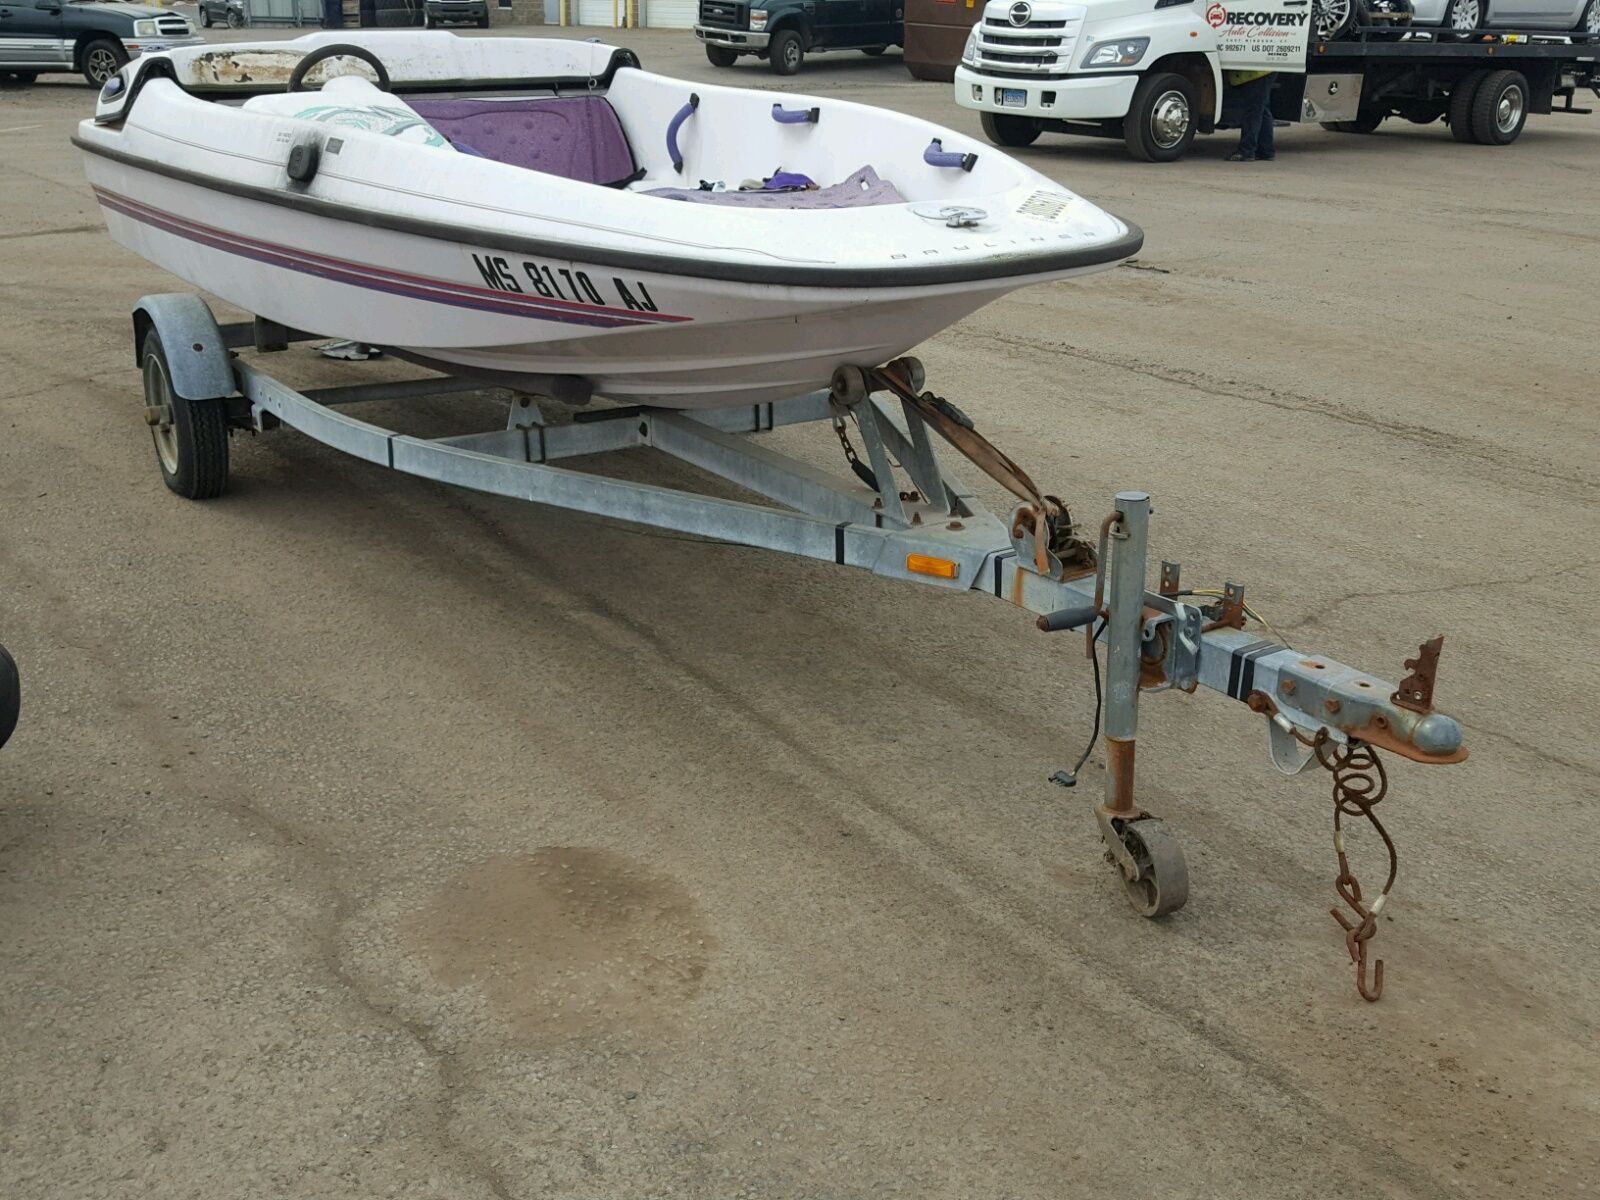 Bought SeaDoo Spark Trixx Jet Ski at Throwaway Price from